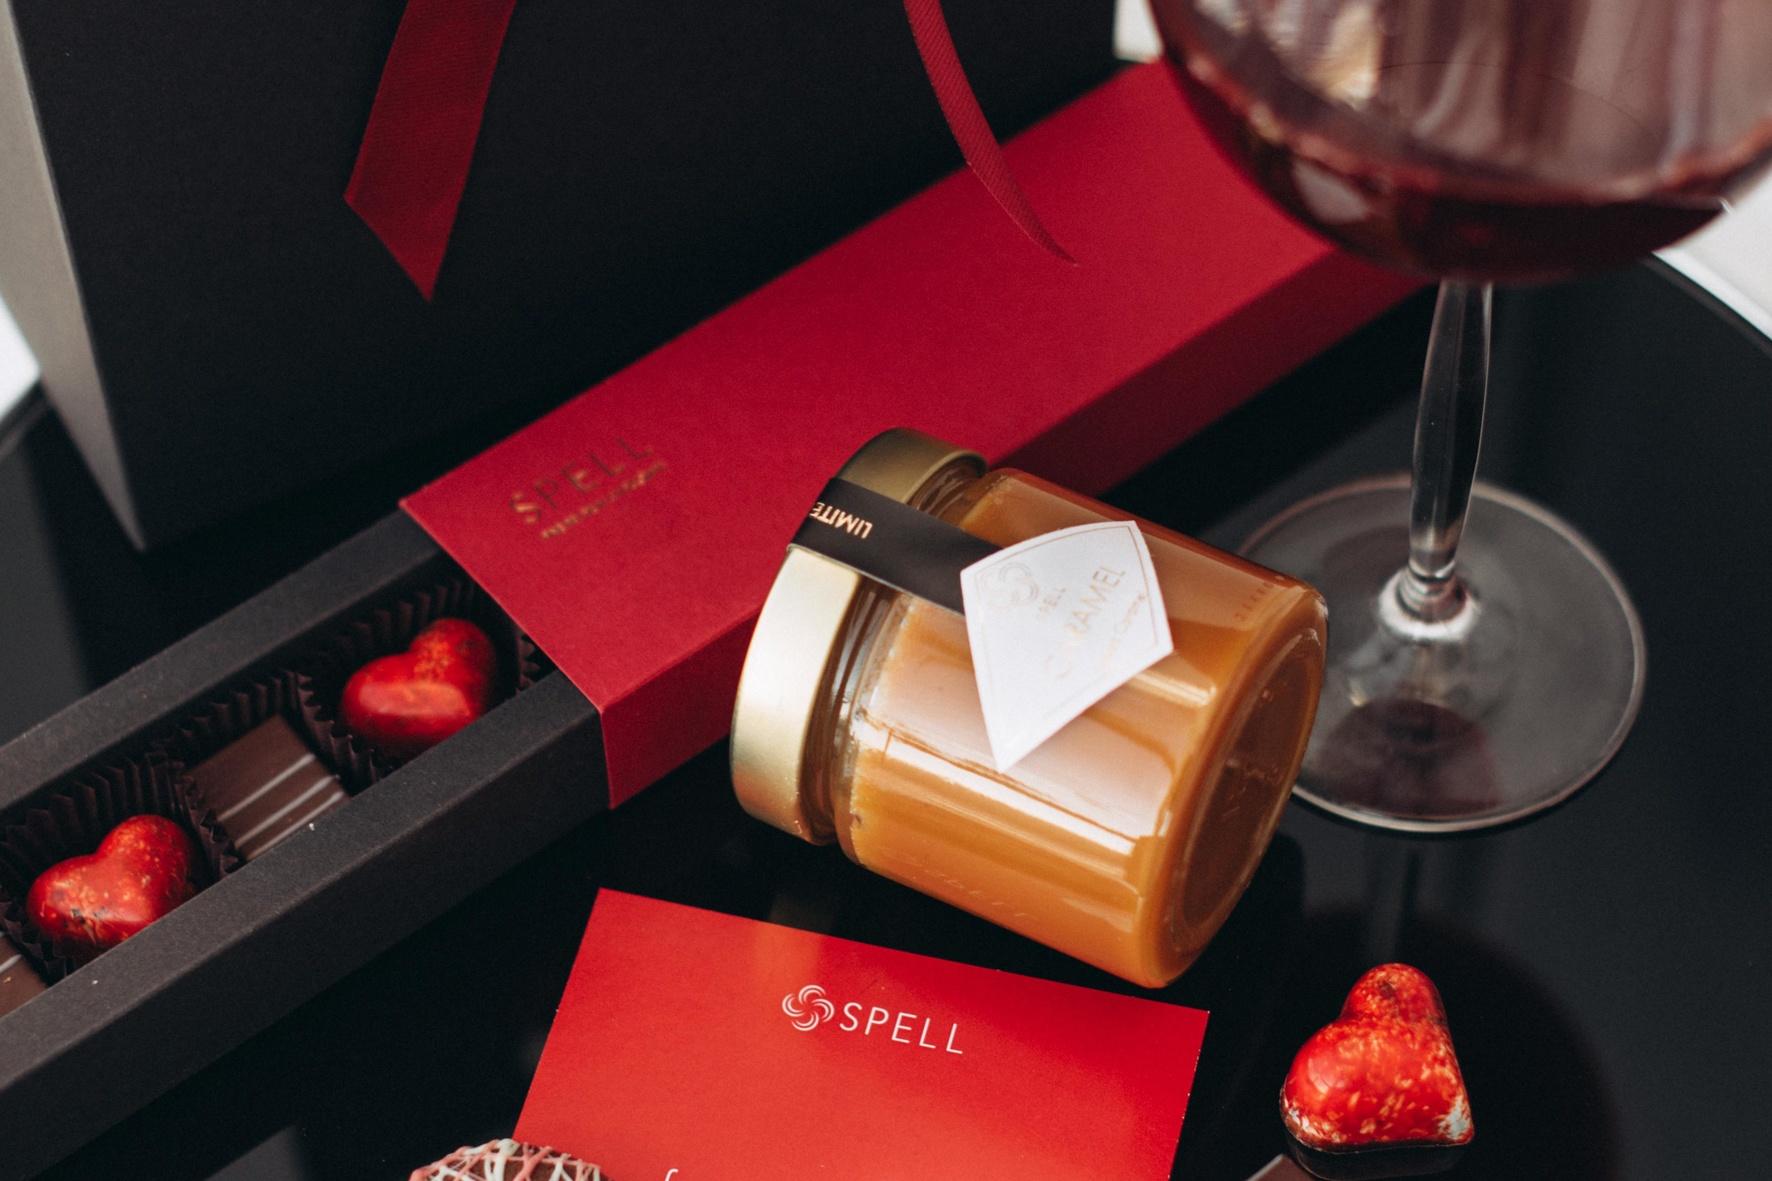 spell конфеты, подарочные наборы spell